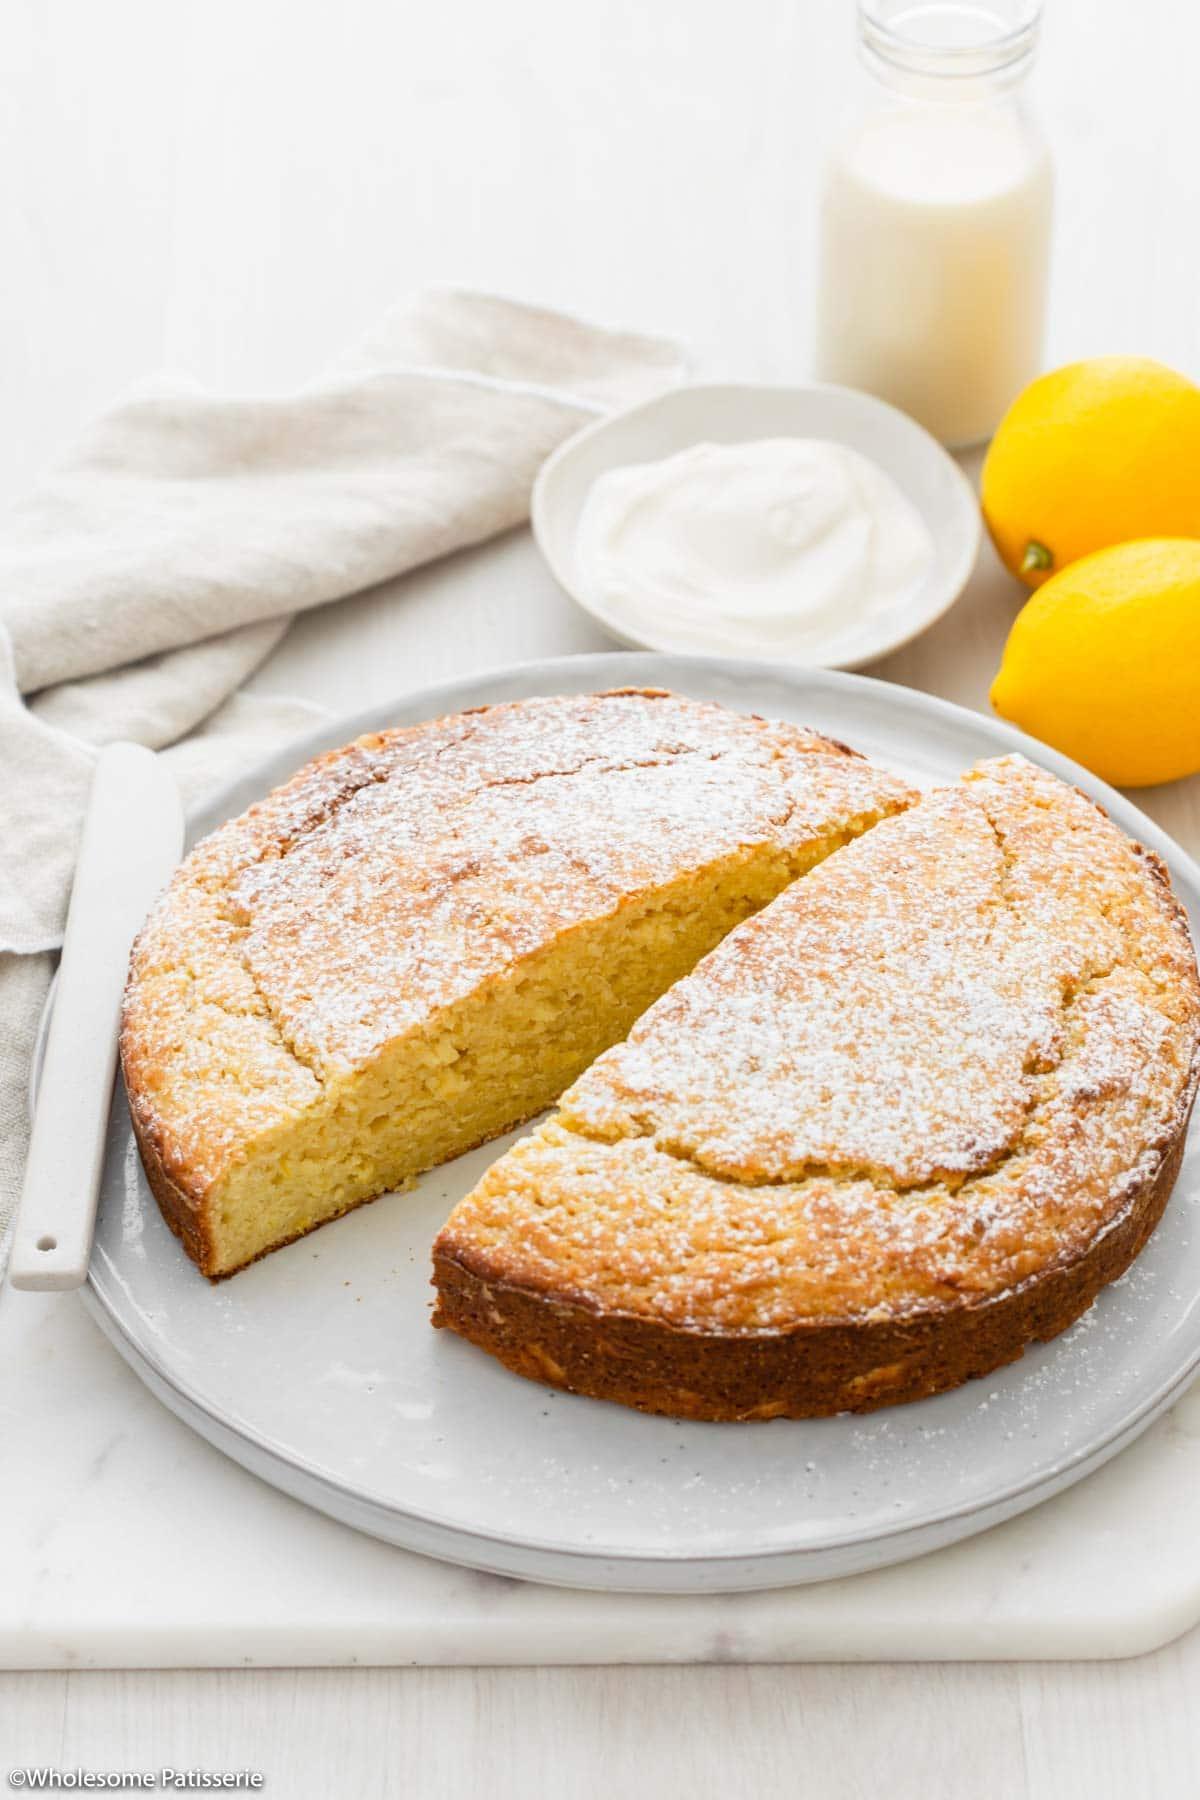 Image of lemon yoghurt cake sliced in half